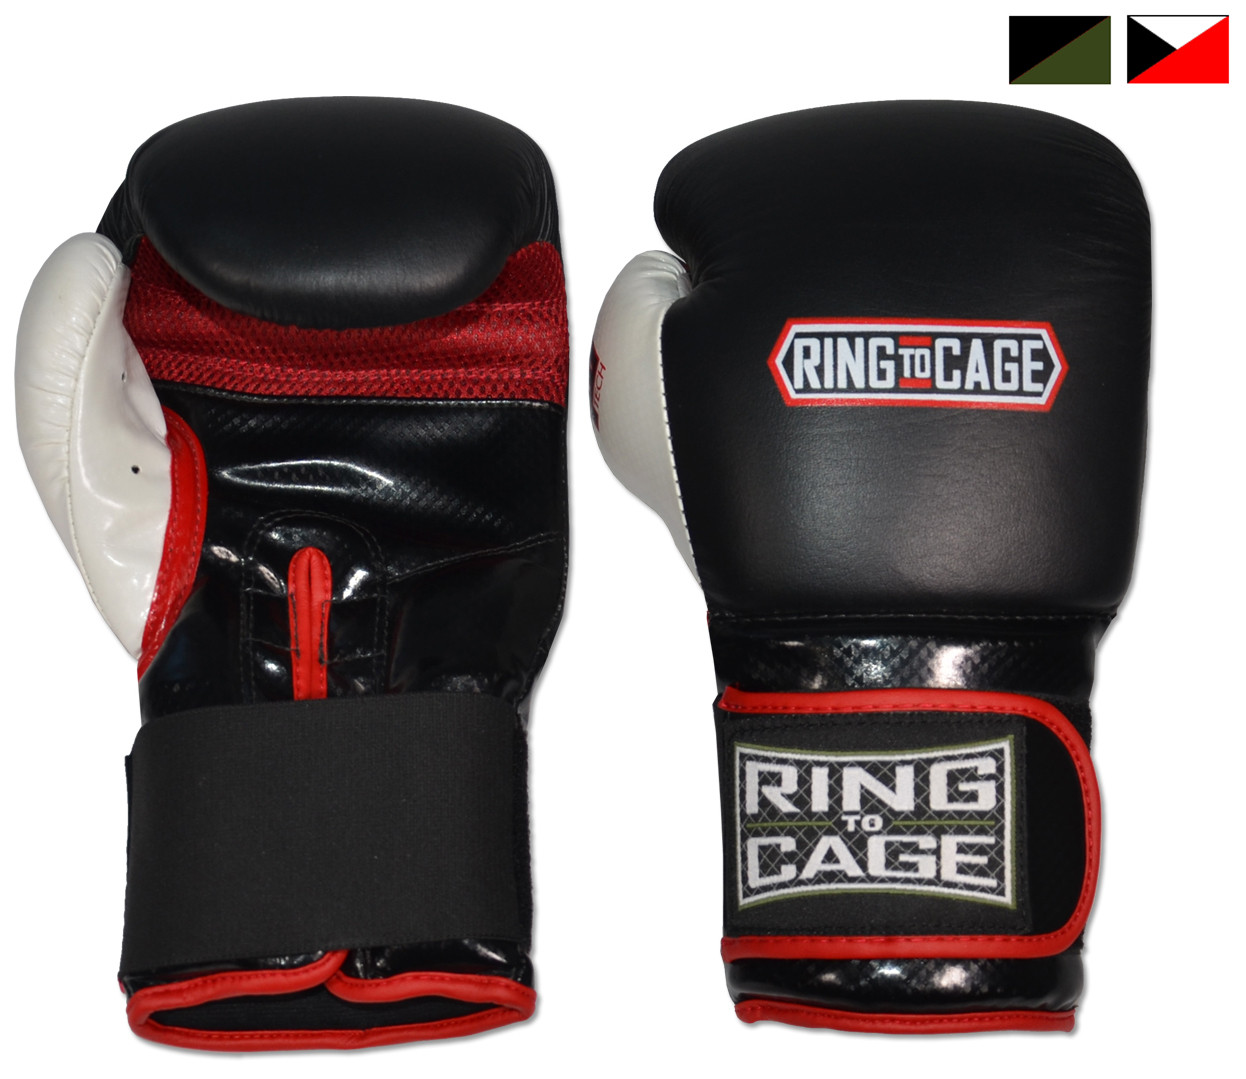 MMA Kickboxing Cardio Aerobic Boxing Krav MAGA Ring to Cage R2C Super Bag Boxing Gloves for Muay Thai